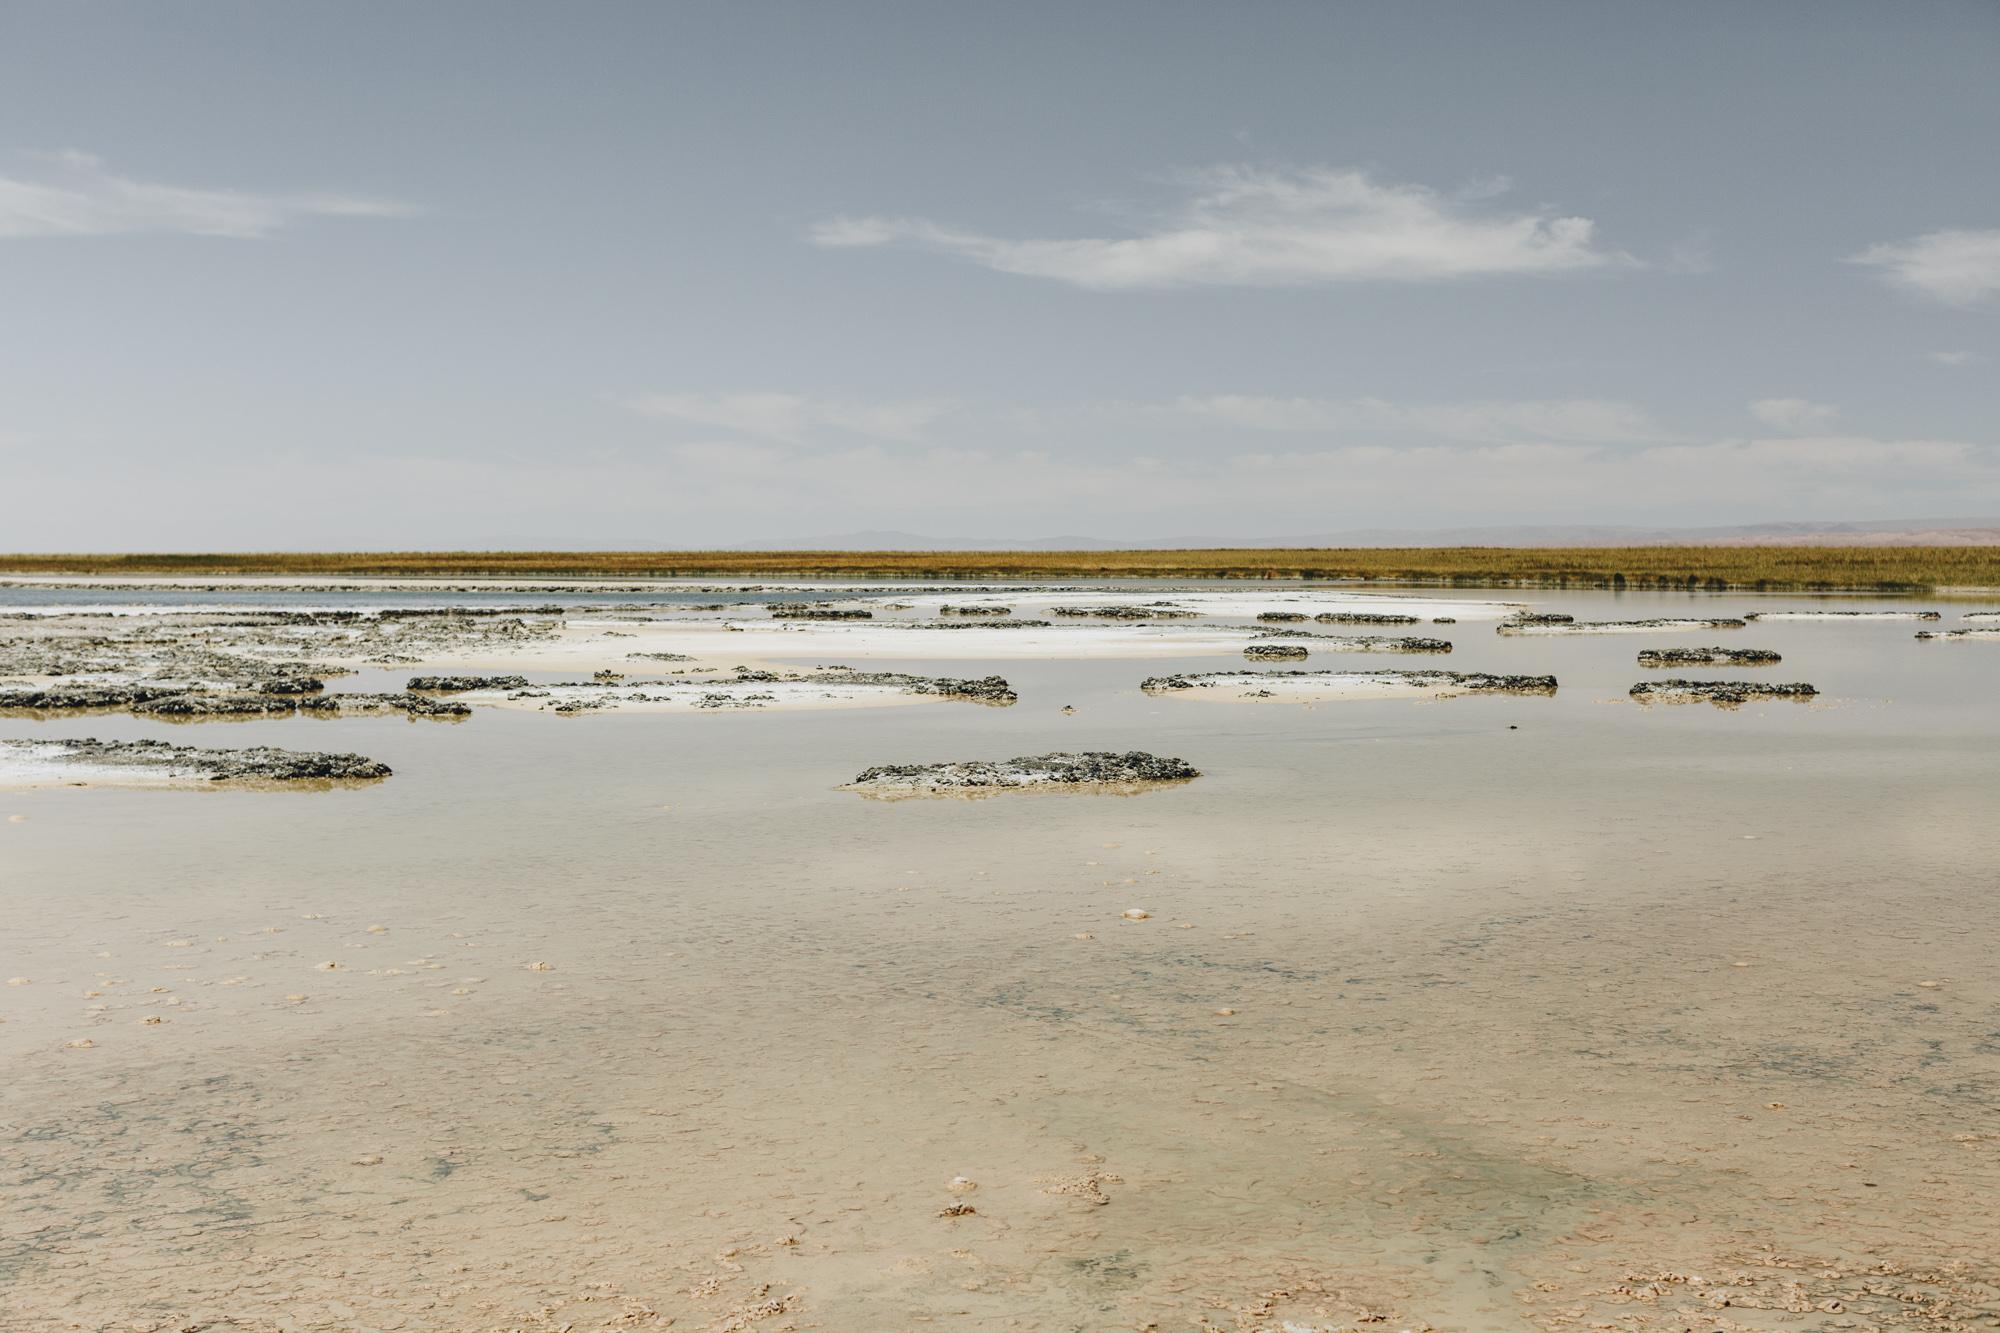 Mael Lambla photographer Chile San pedro atacama desert-50.jpg